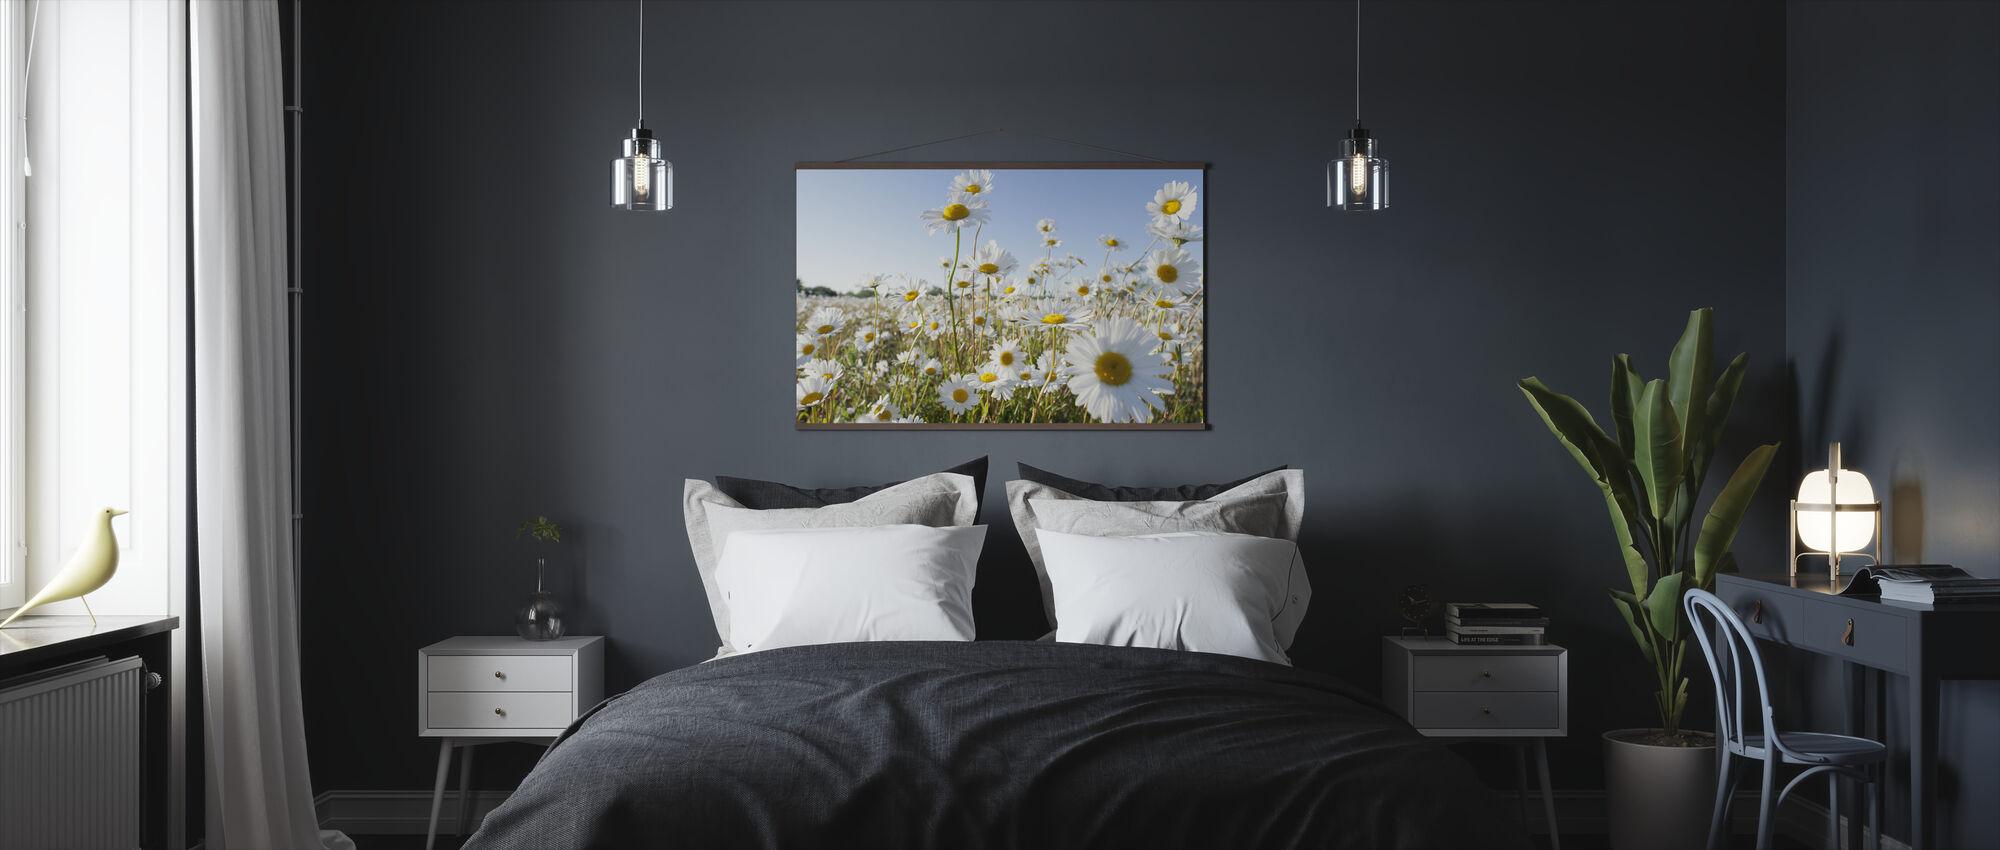 Marguerite - Poster - Bedroom